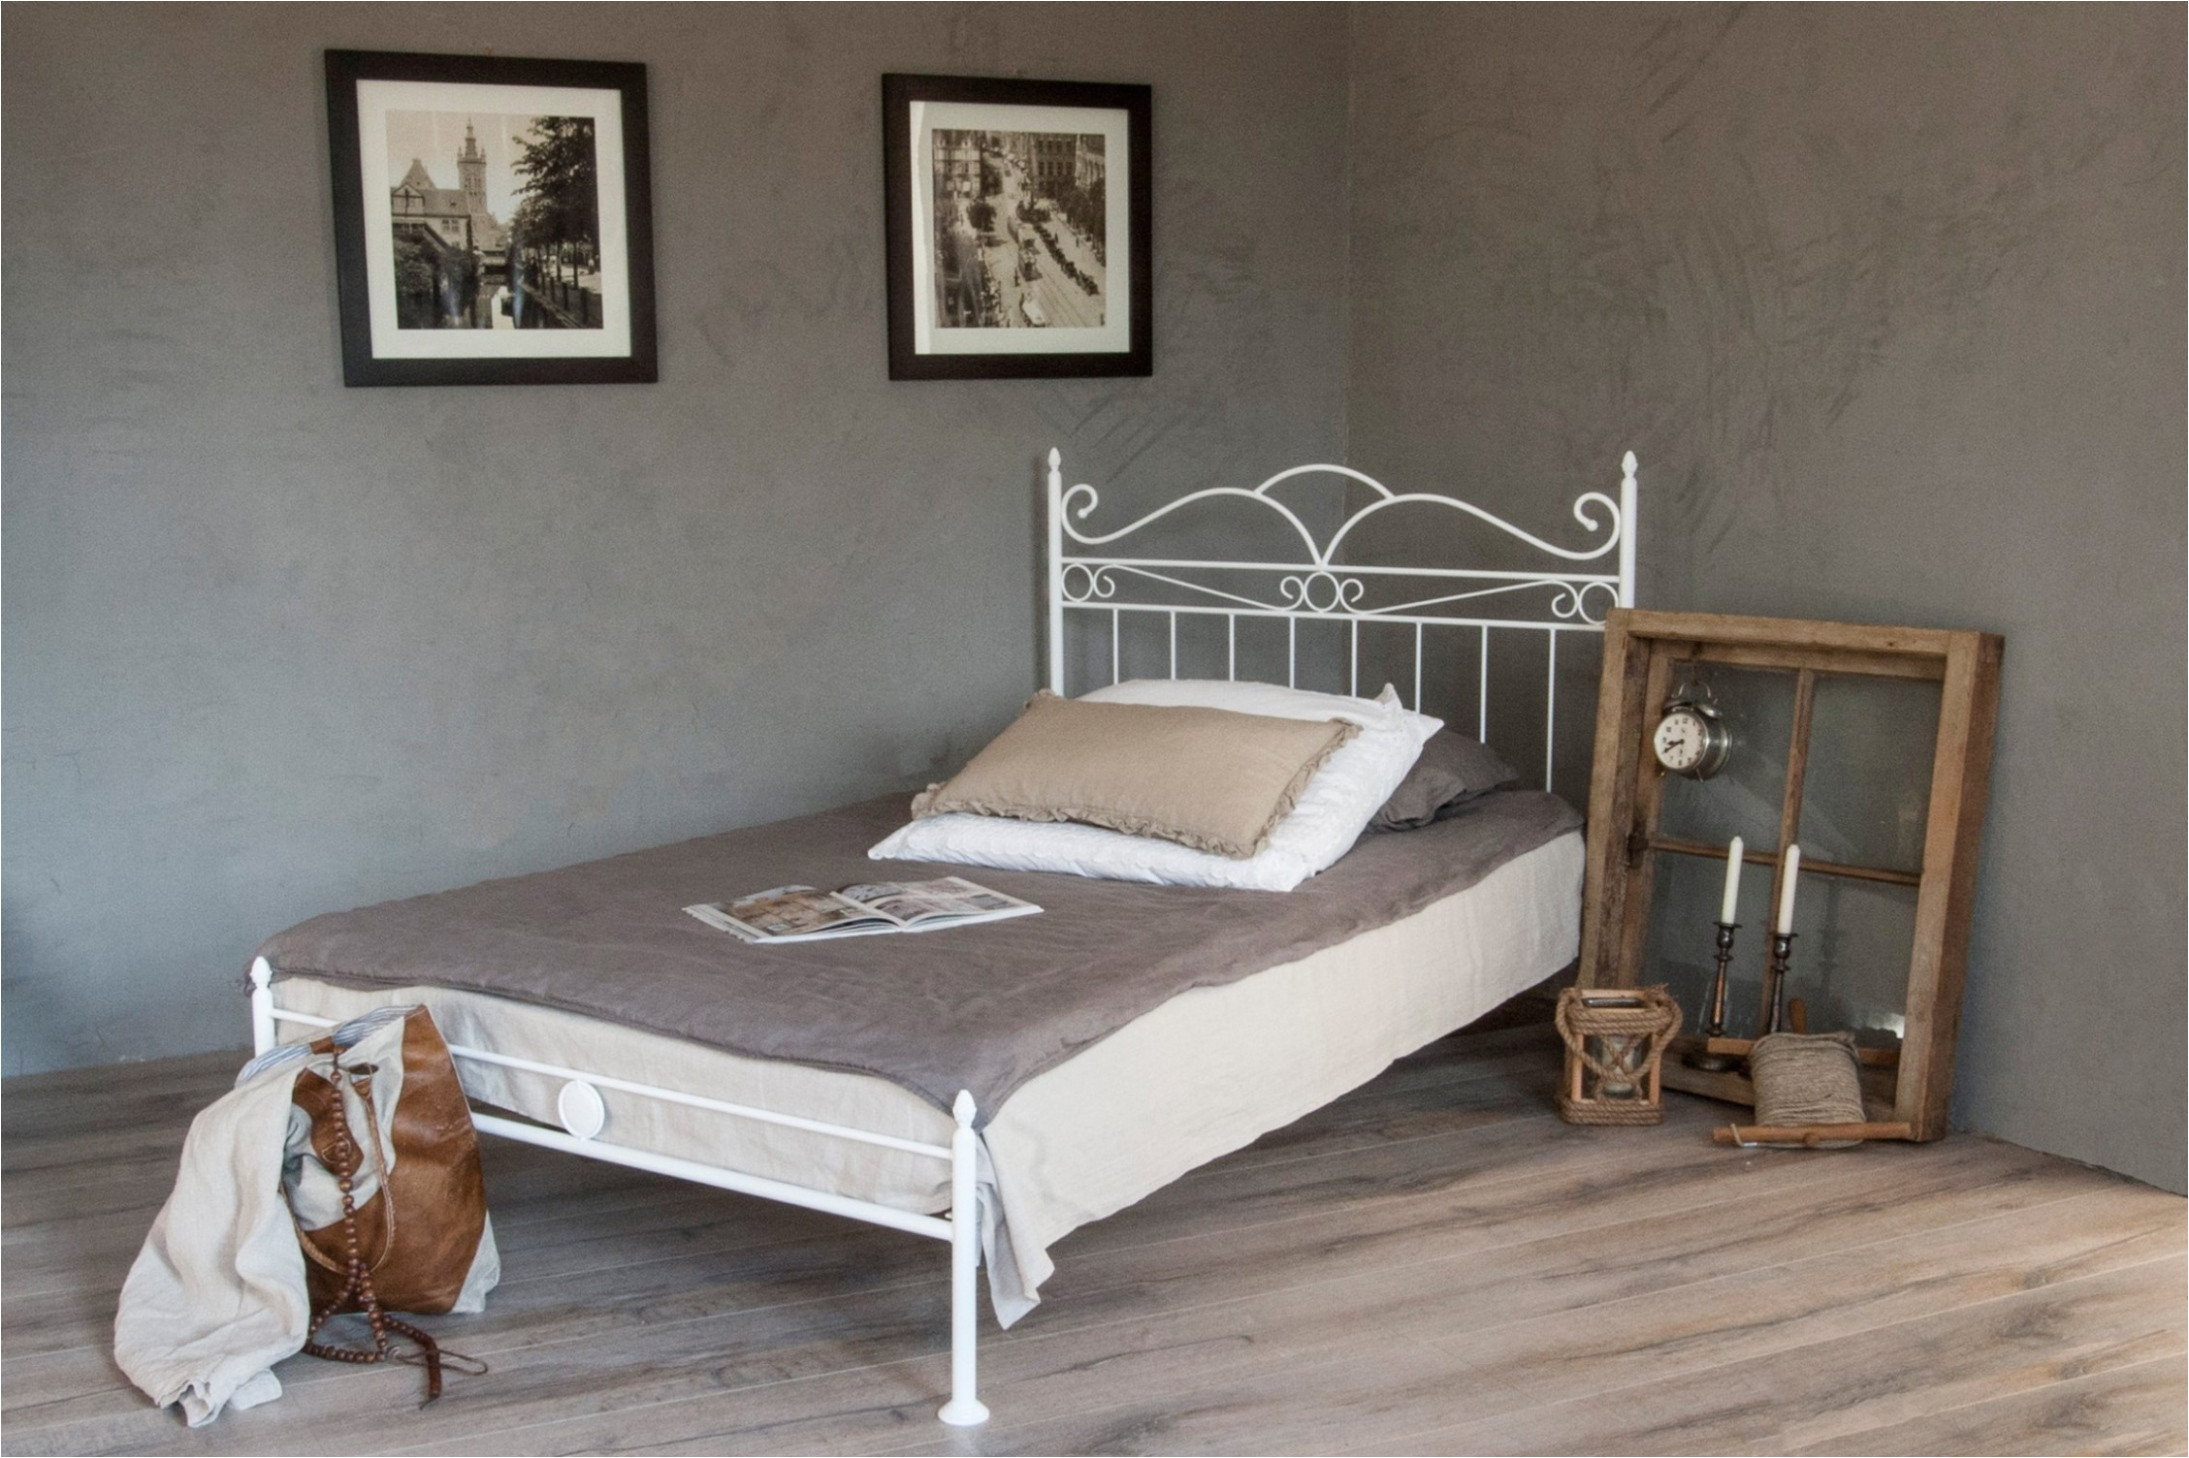 Ikea Luroy Slatted Bed Base Review King Bed Frames Rabbssteak House